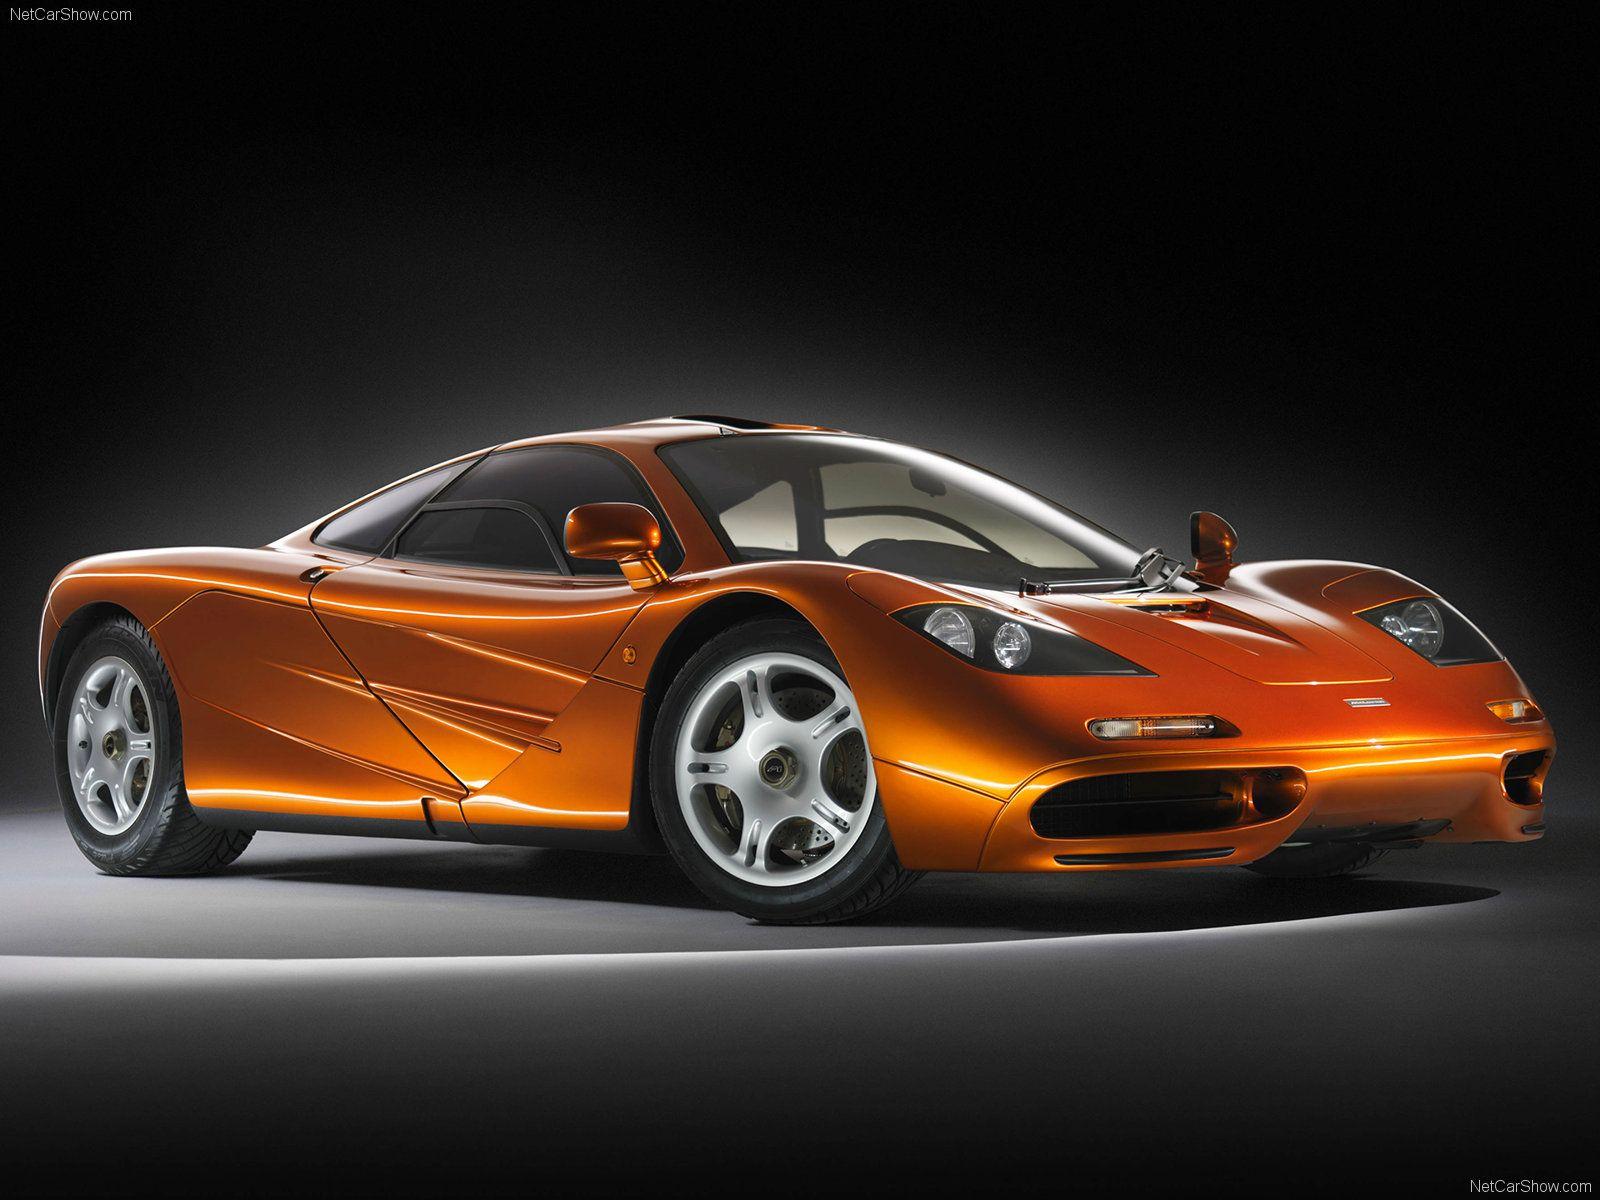 Mcleron F1 My Dream Car Who Broke Records On My Birthday Sports Car Mclaren F1 Super Cars